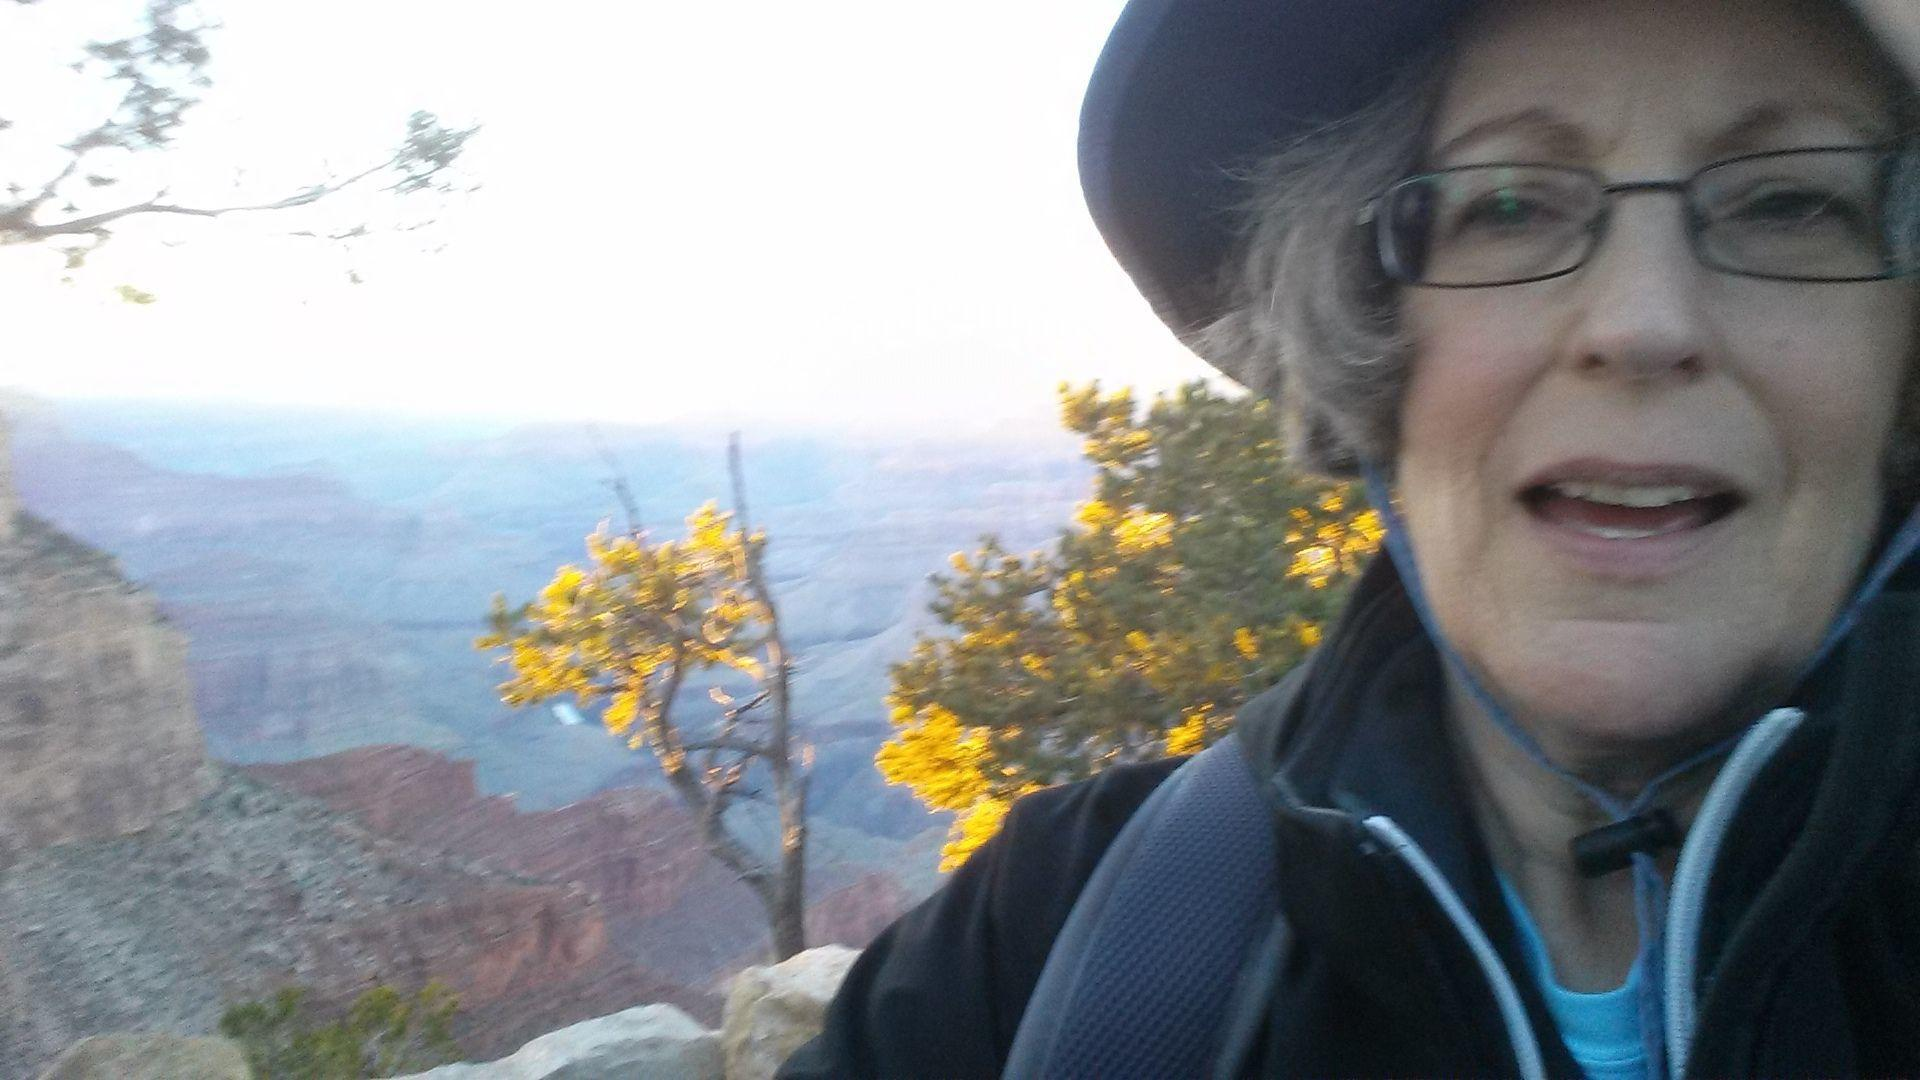 Amc Marlton 8 >> Ann - Appalachian Mountain Club Delaware Valley Chapter (Plymouth Meeting, PA) | Meetup